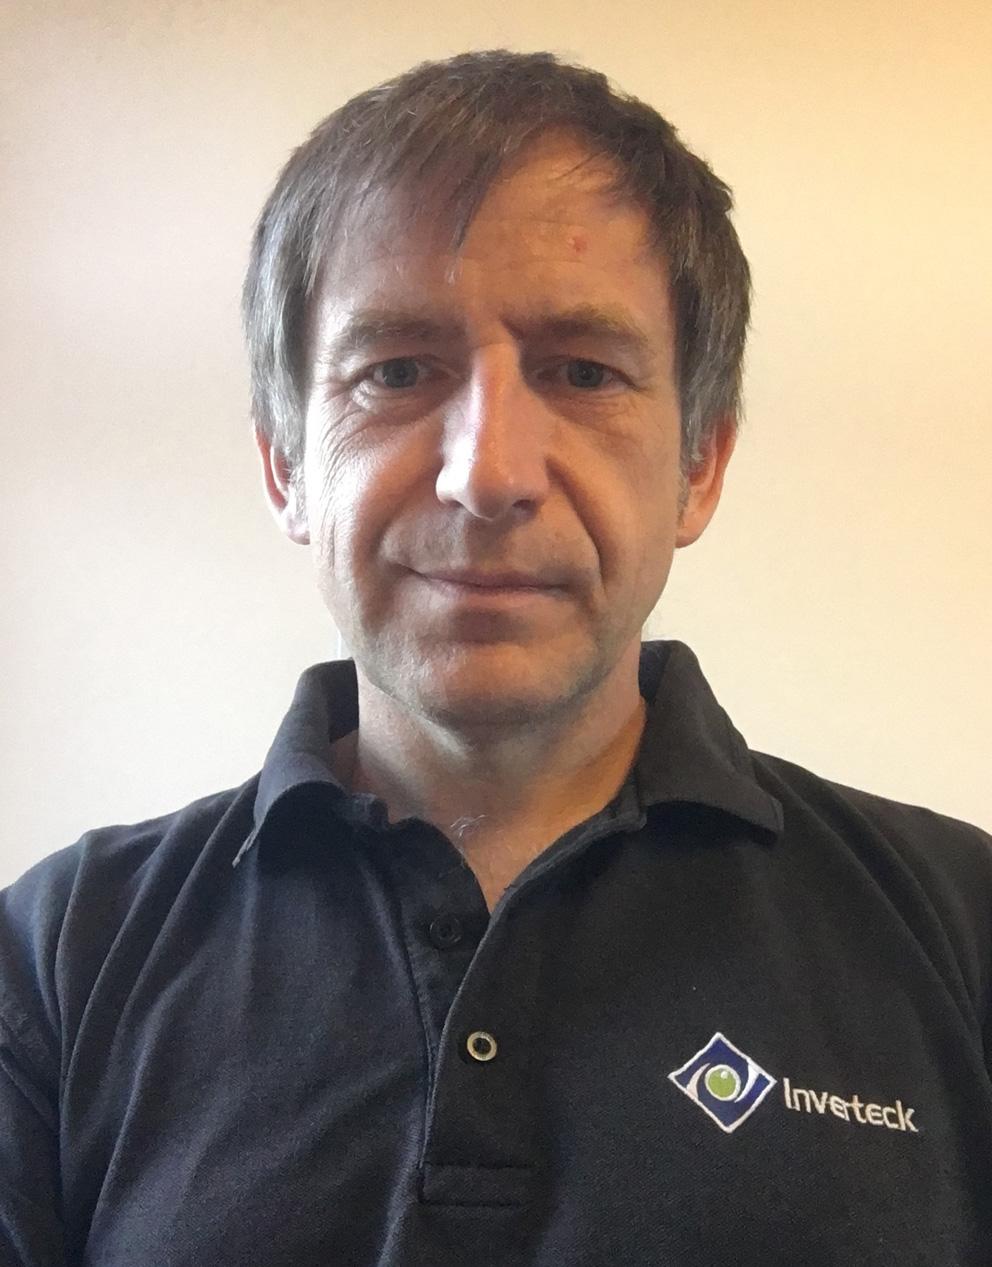 Jason Kelwick Inverteck Managing Director